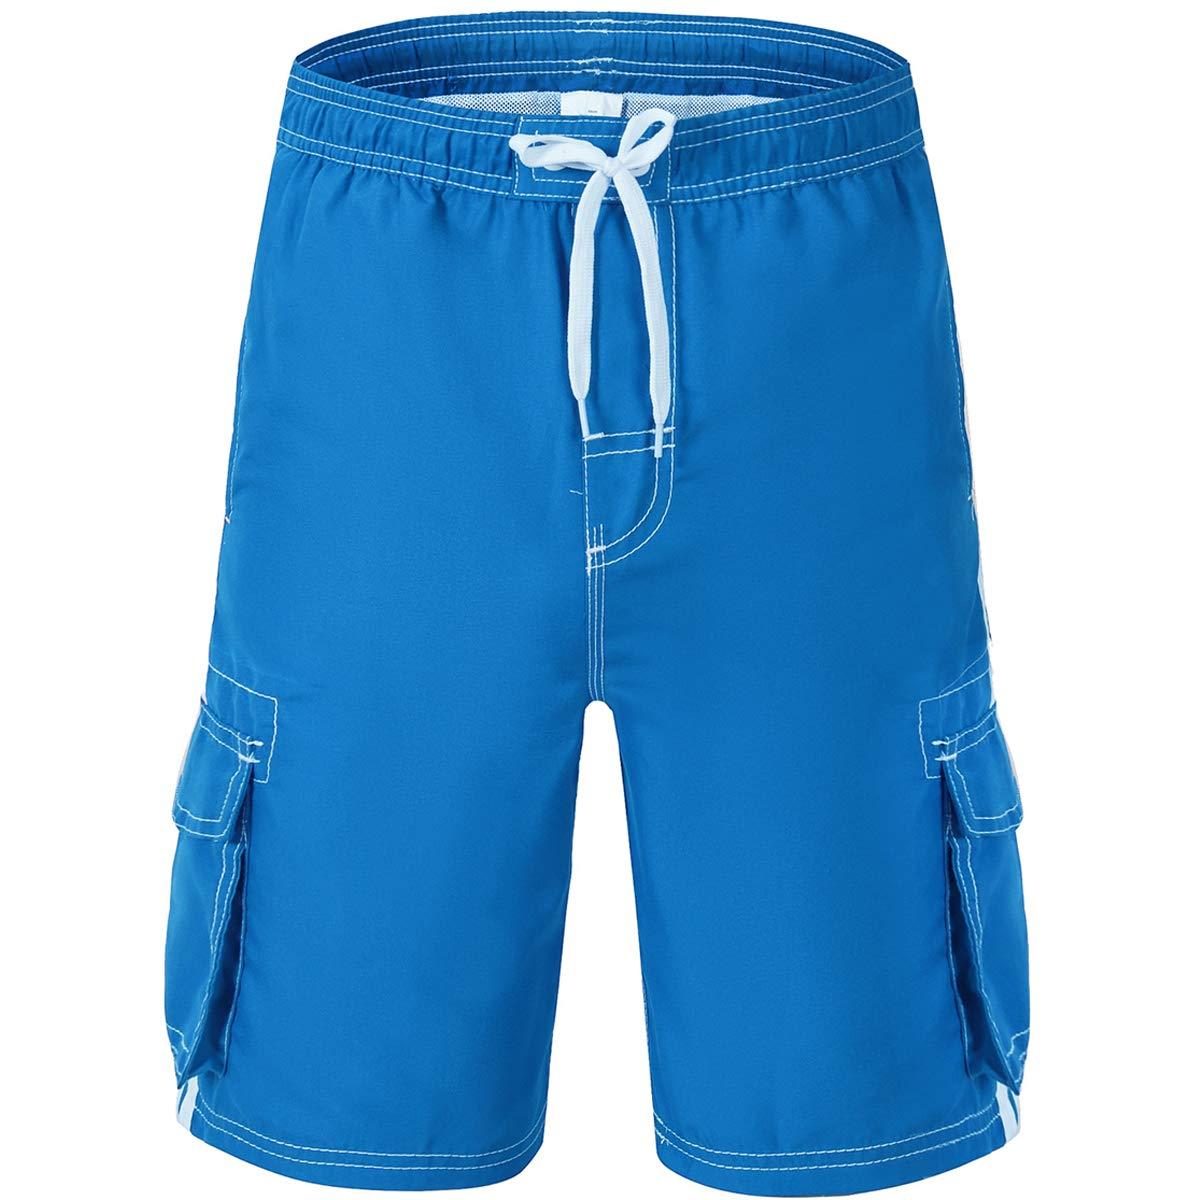 Akula Boys Quick Dry Beach Board Shorts Swim Trunk with Pockets